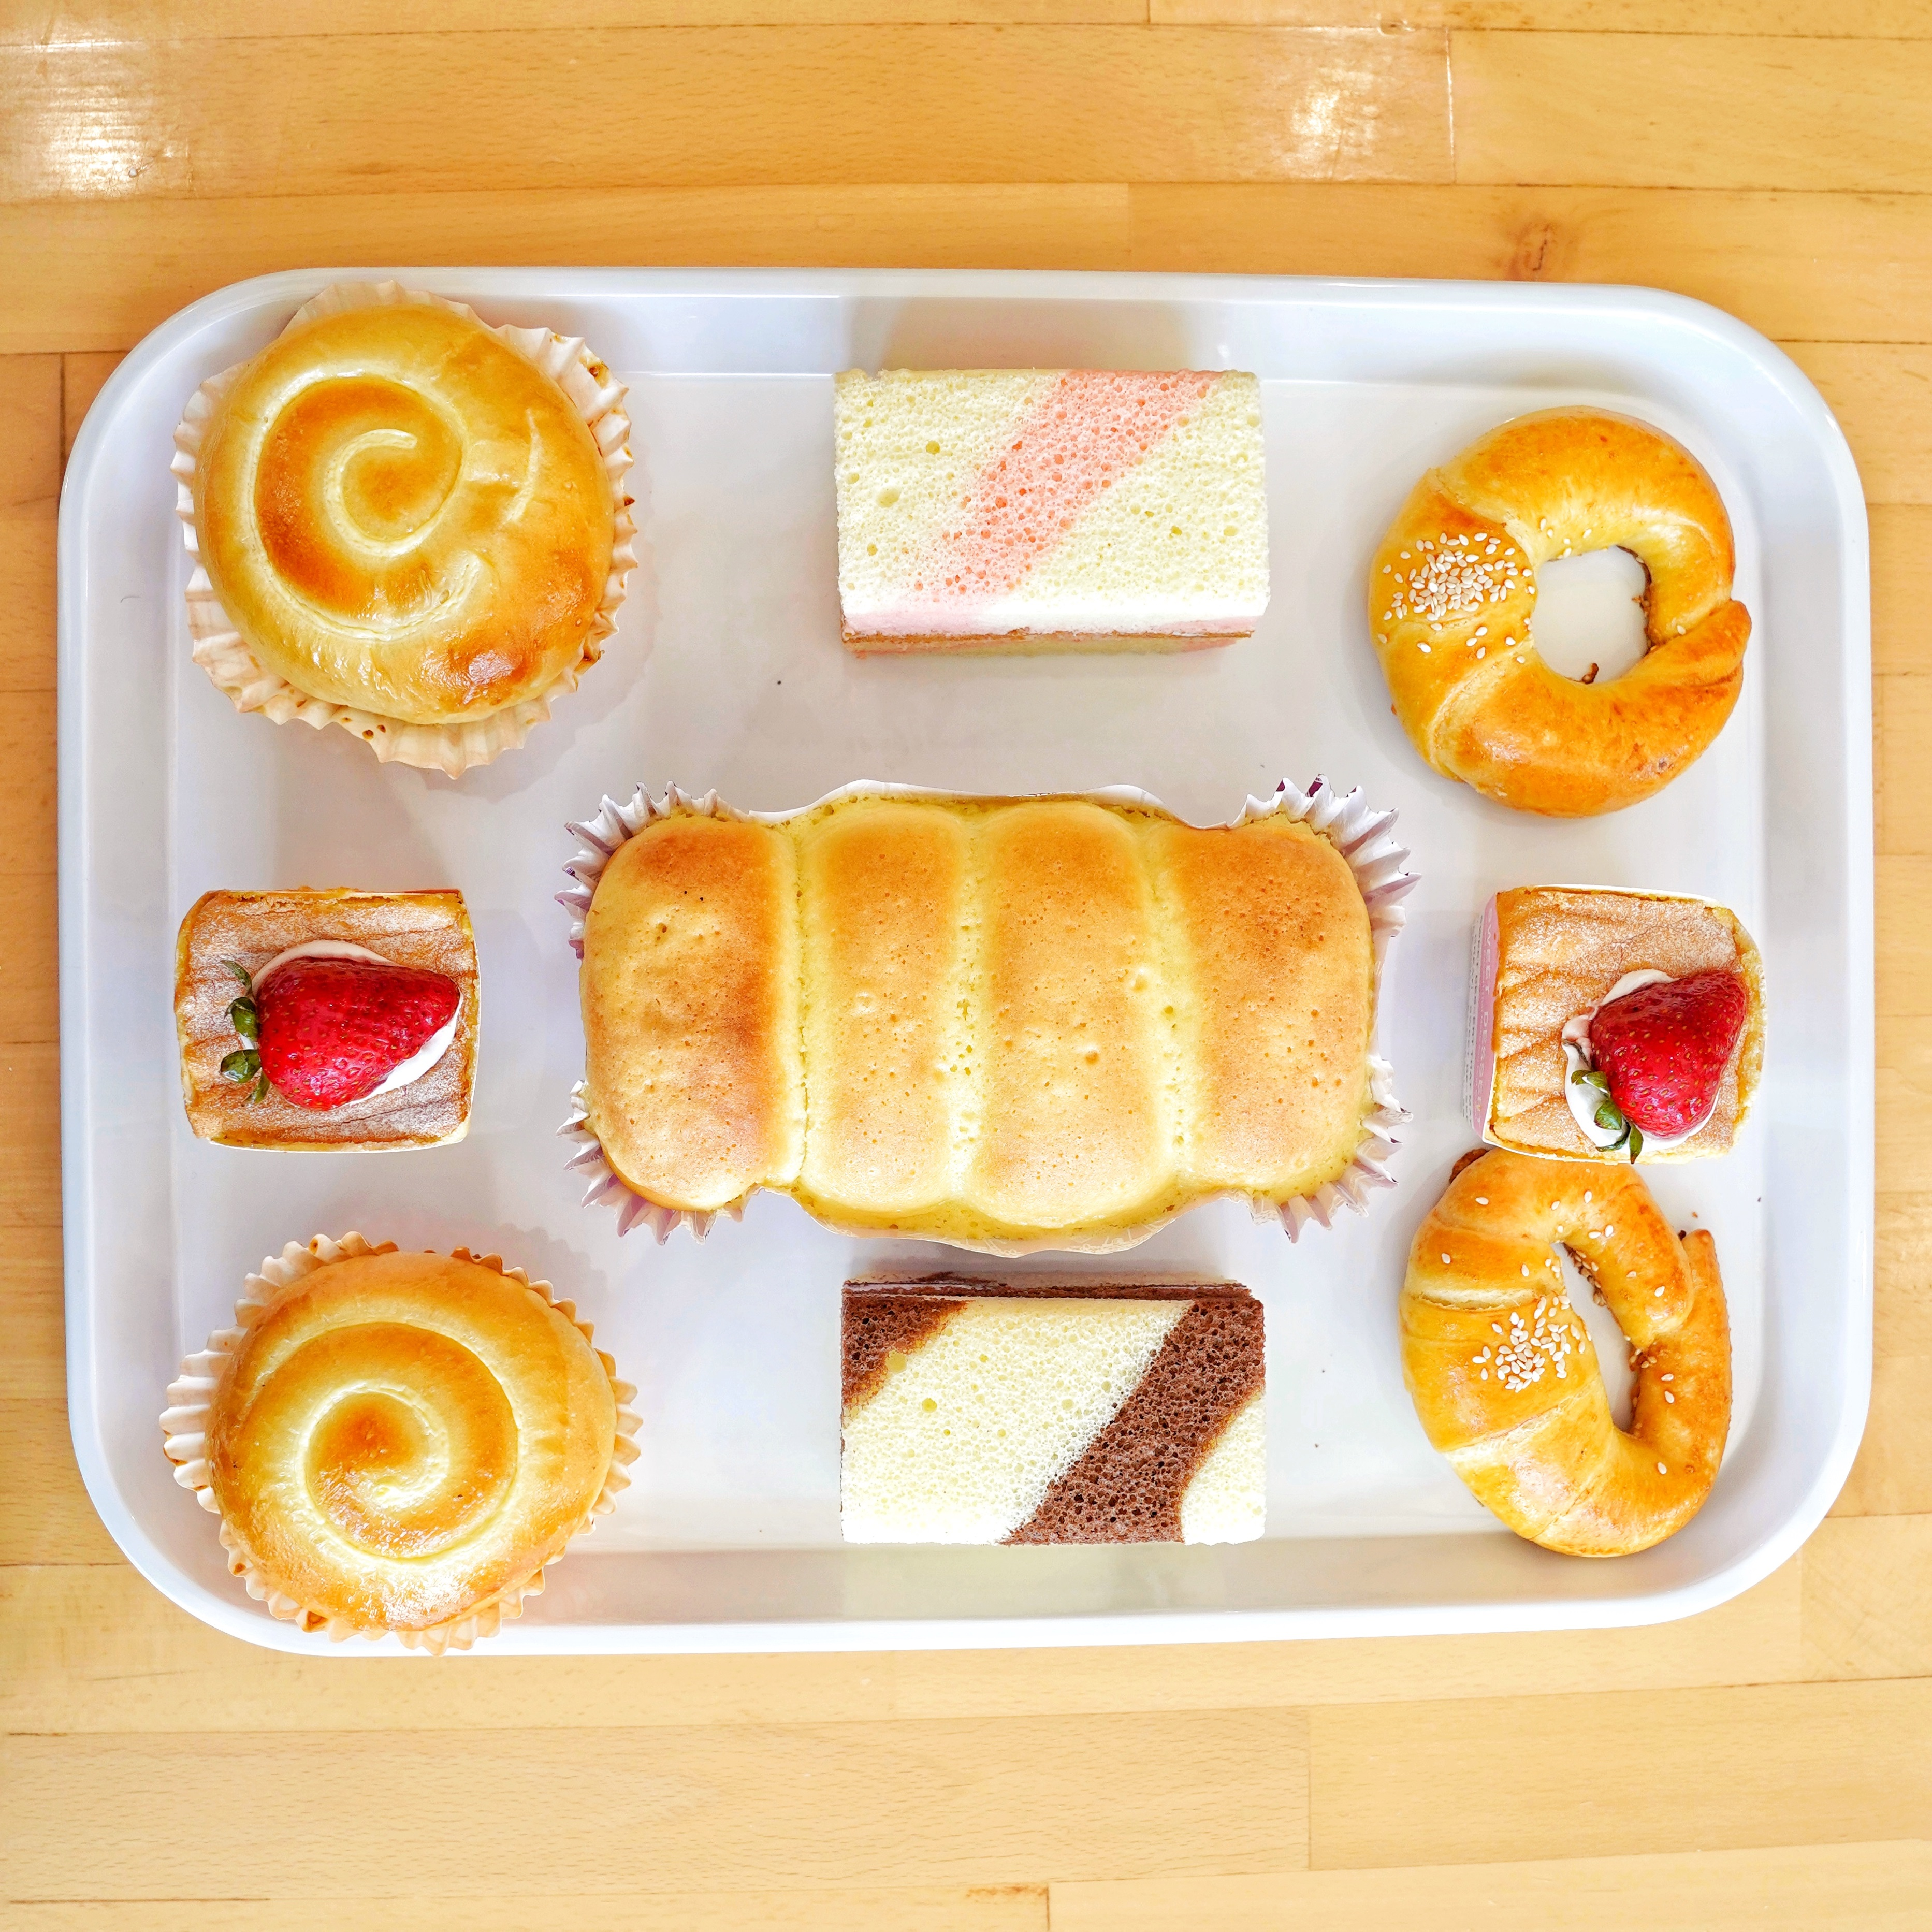 85°C Bakery Café Unloads Its Massively Popular Desserts on Edmonds This Week